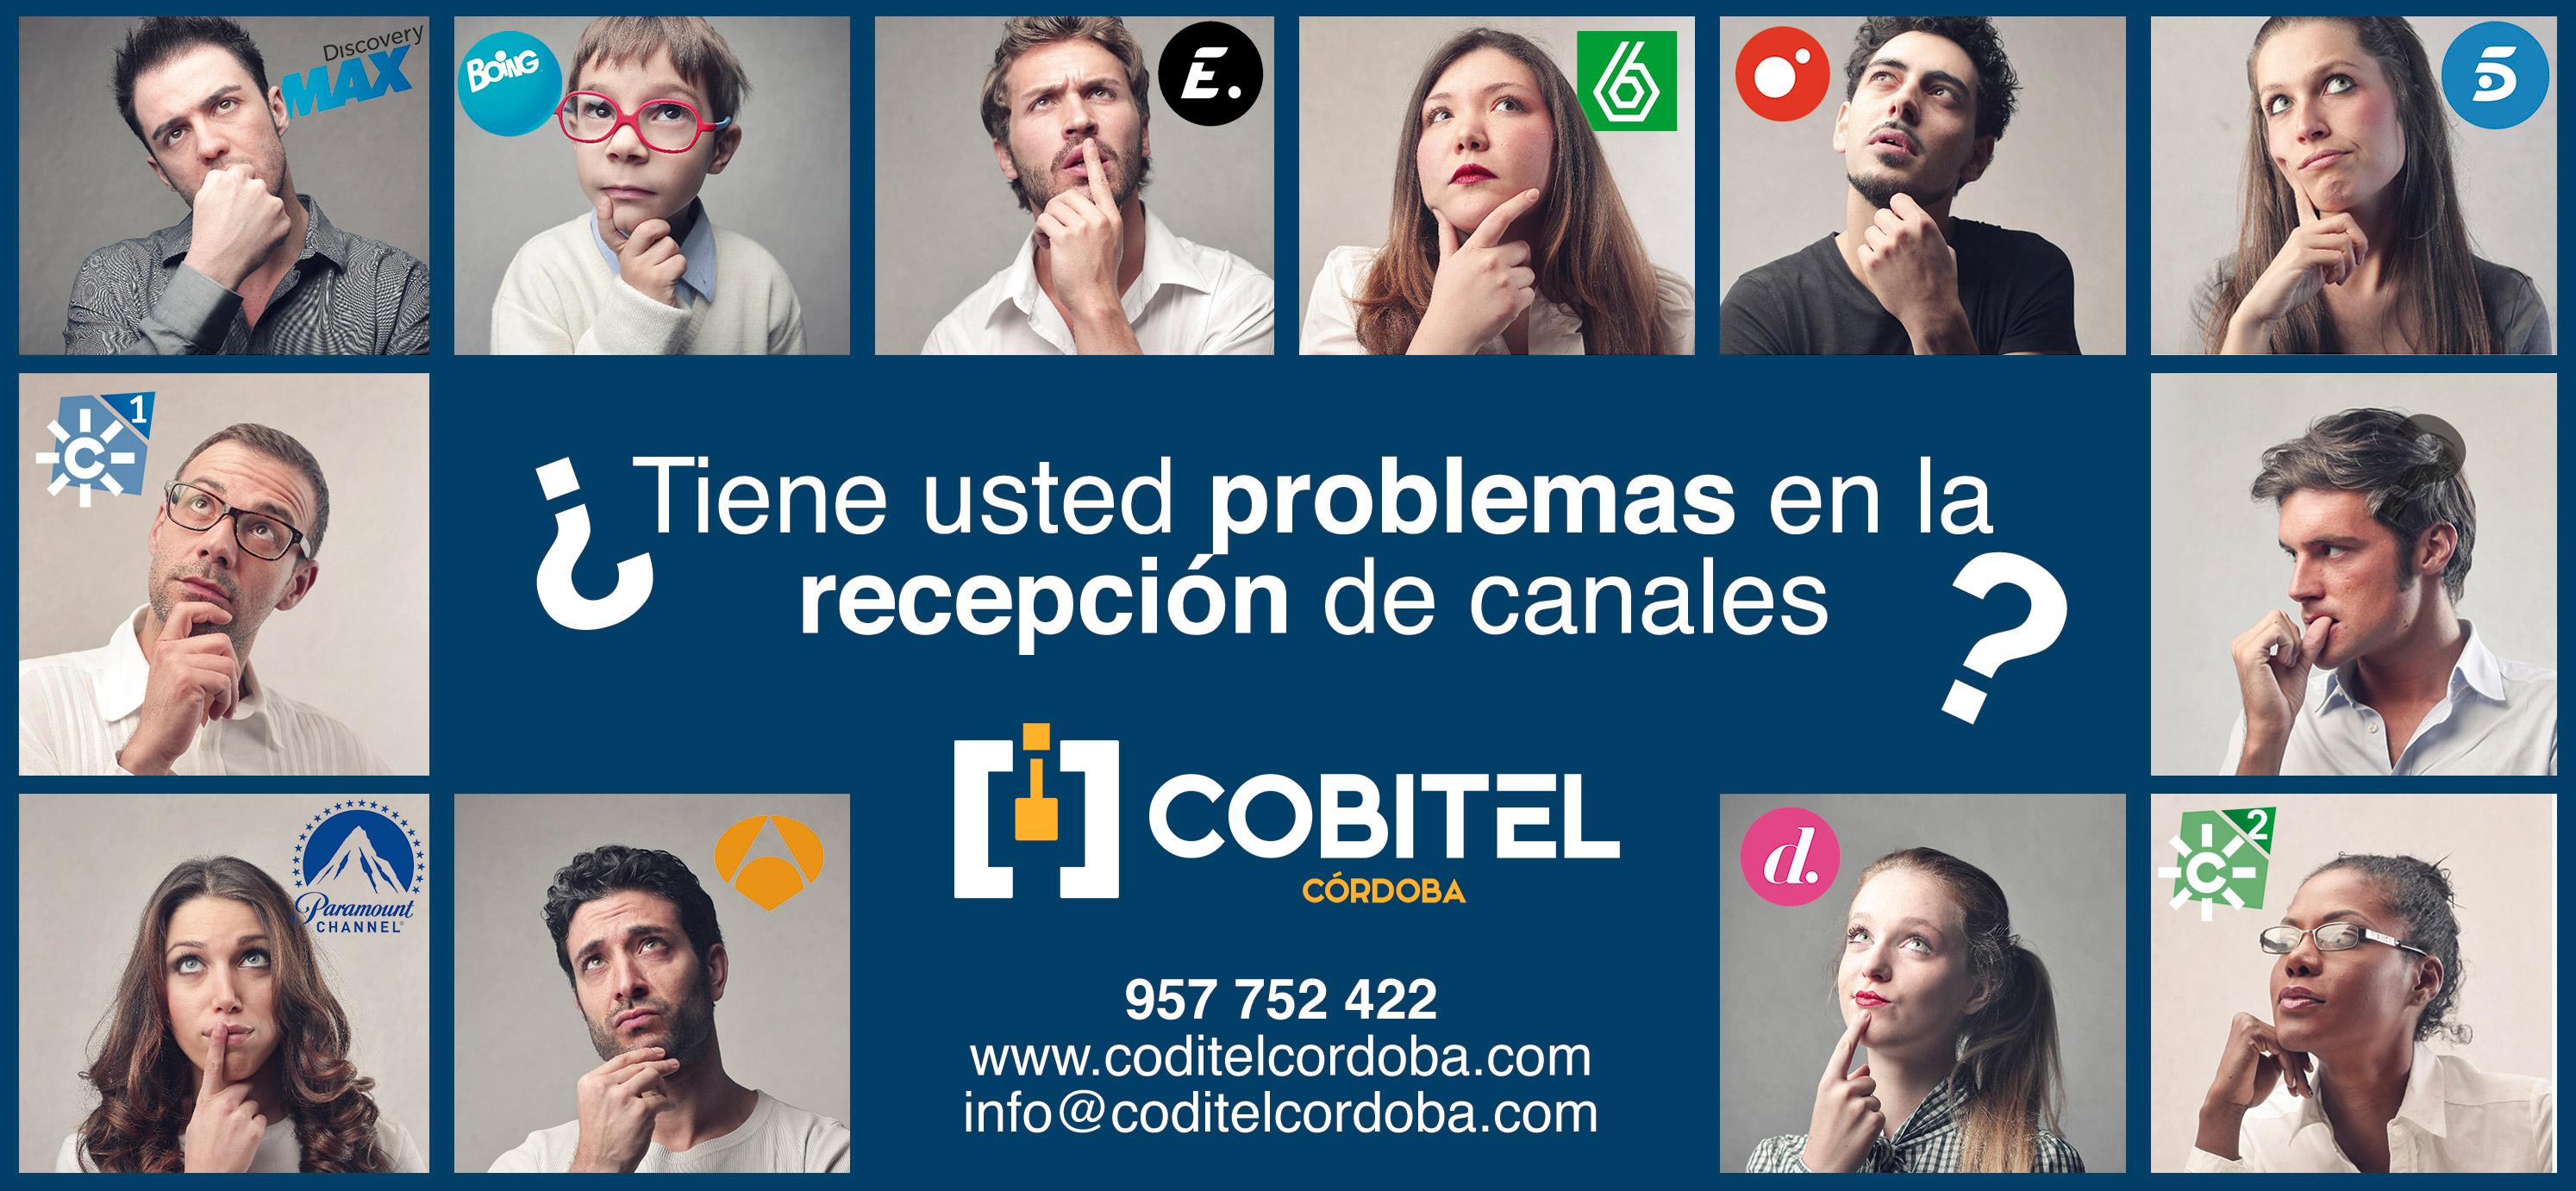 Cobitel-Comunidad